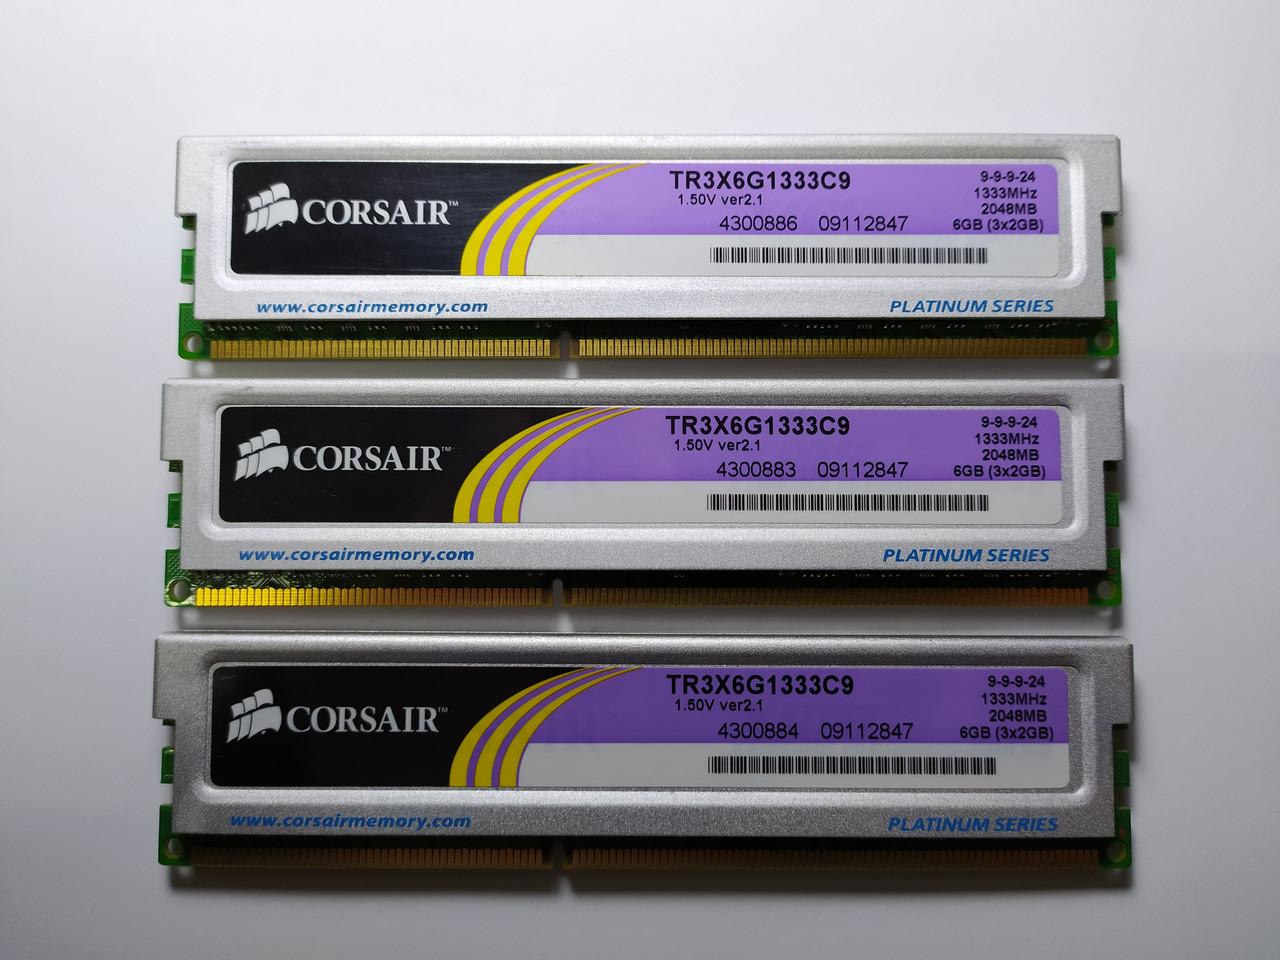 Комплект оперативной памяти Corsair XMS3 DDR3 6Gb (3*2Gb) 1333MHz PC3-10600 (TR3X6G1333C9) Б/У